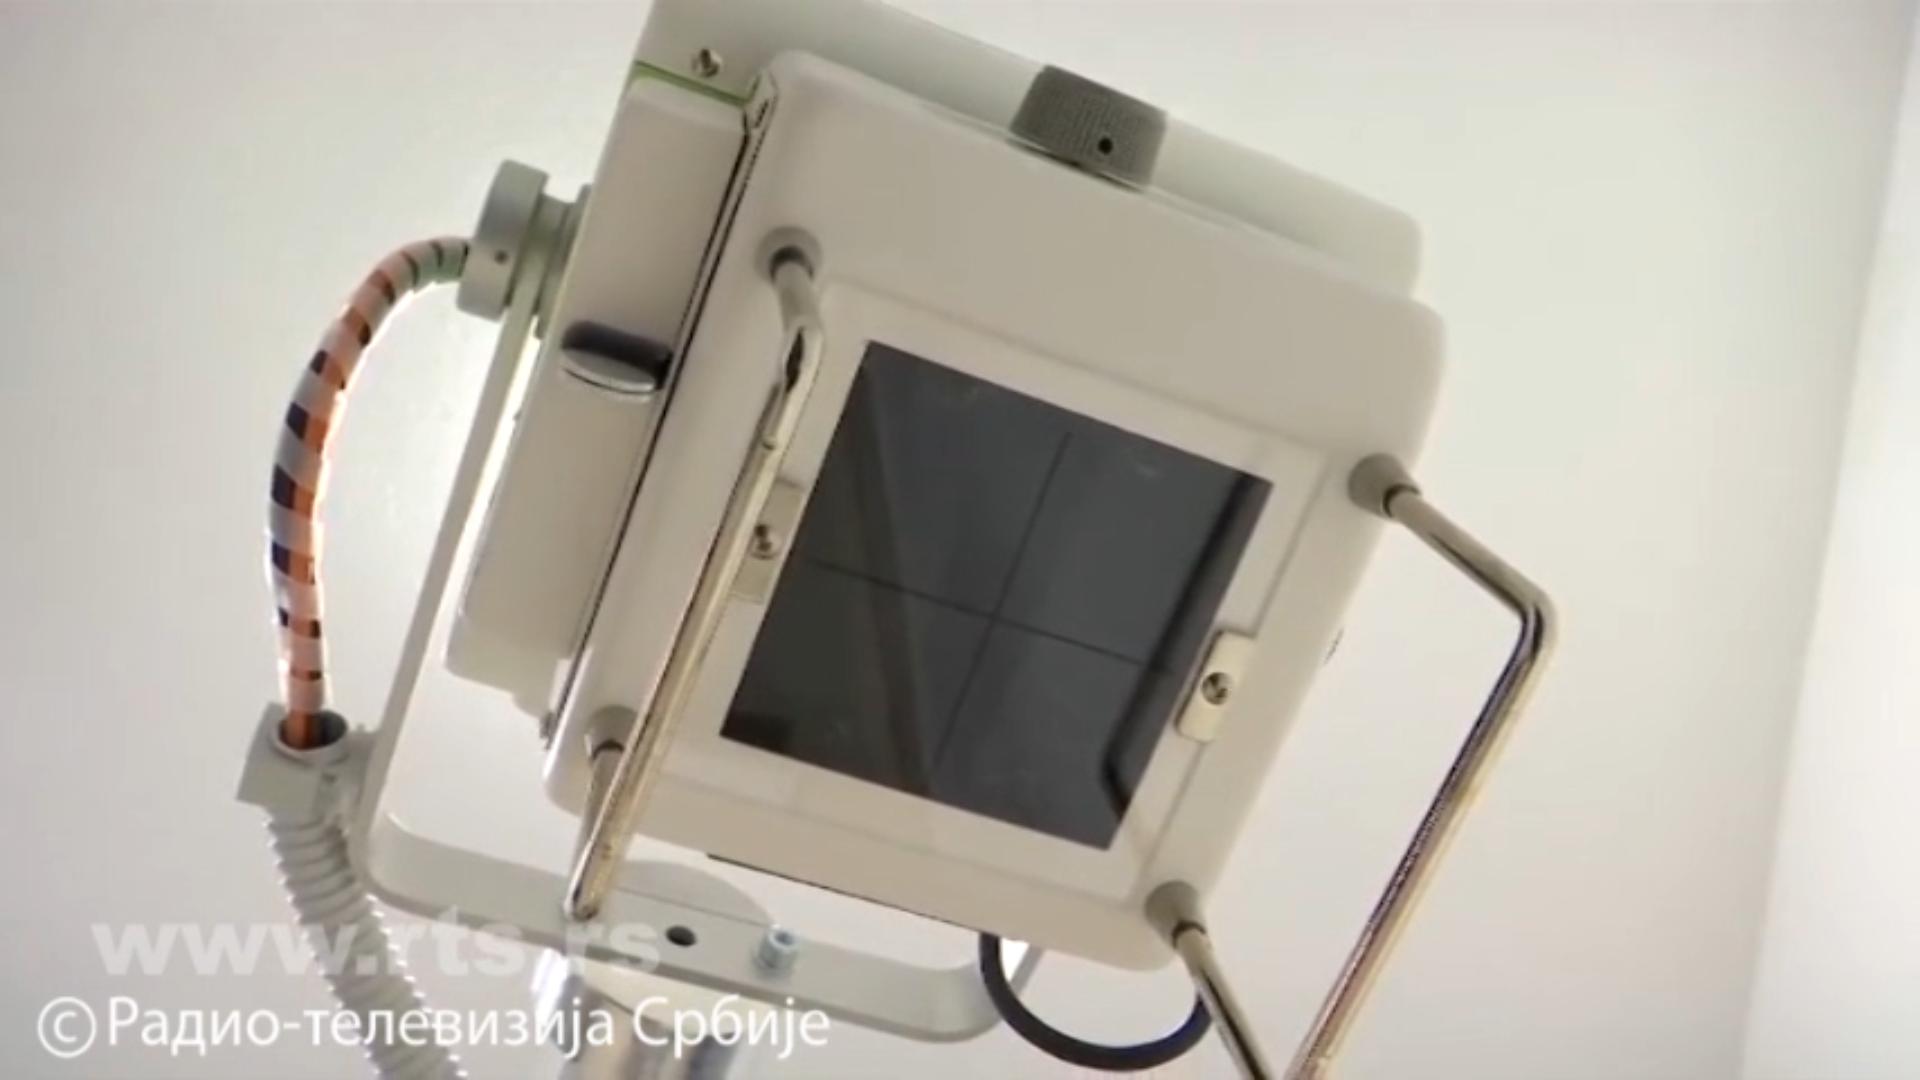 mobilni-rendgen-aparat-za-bolnicu-u-pasjanu